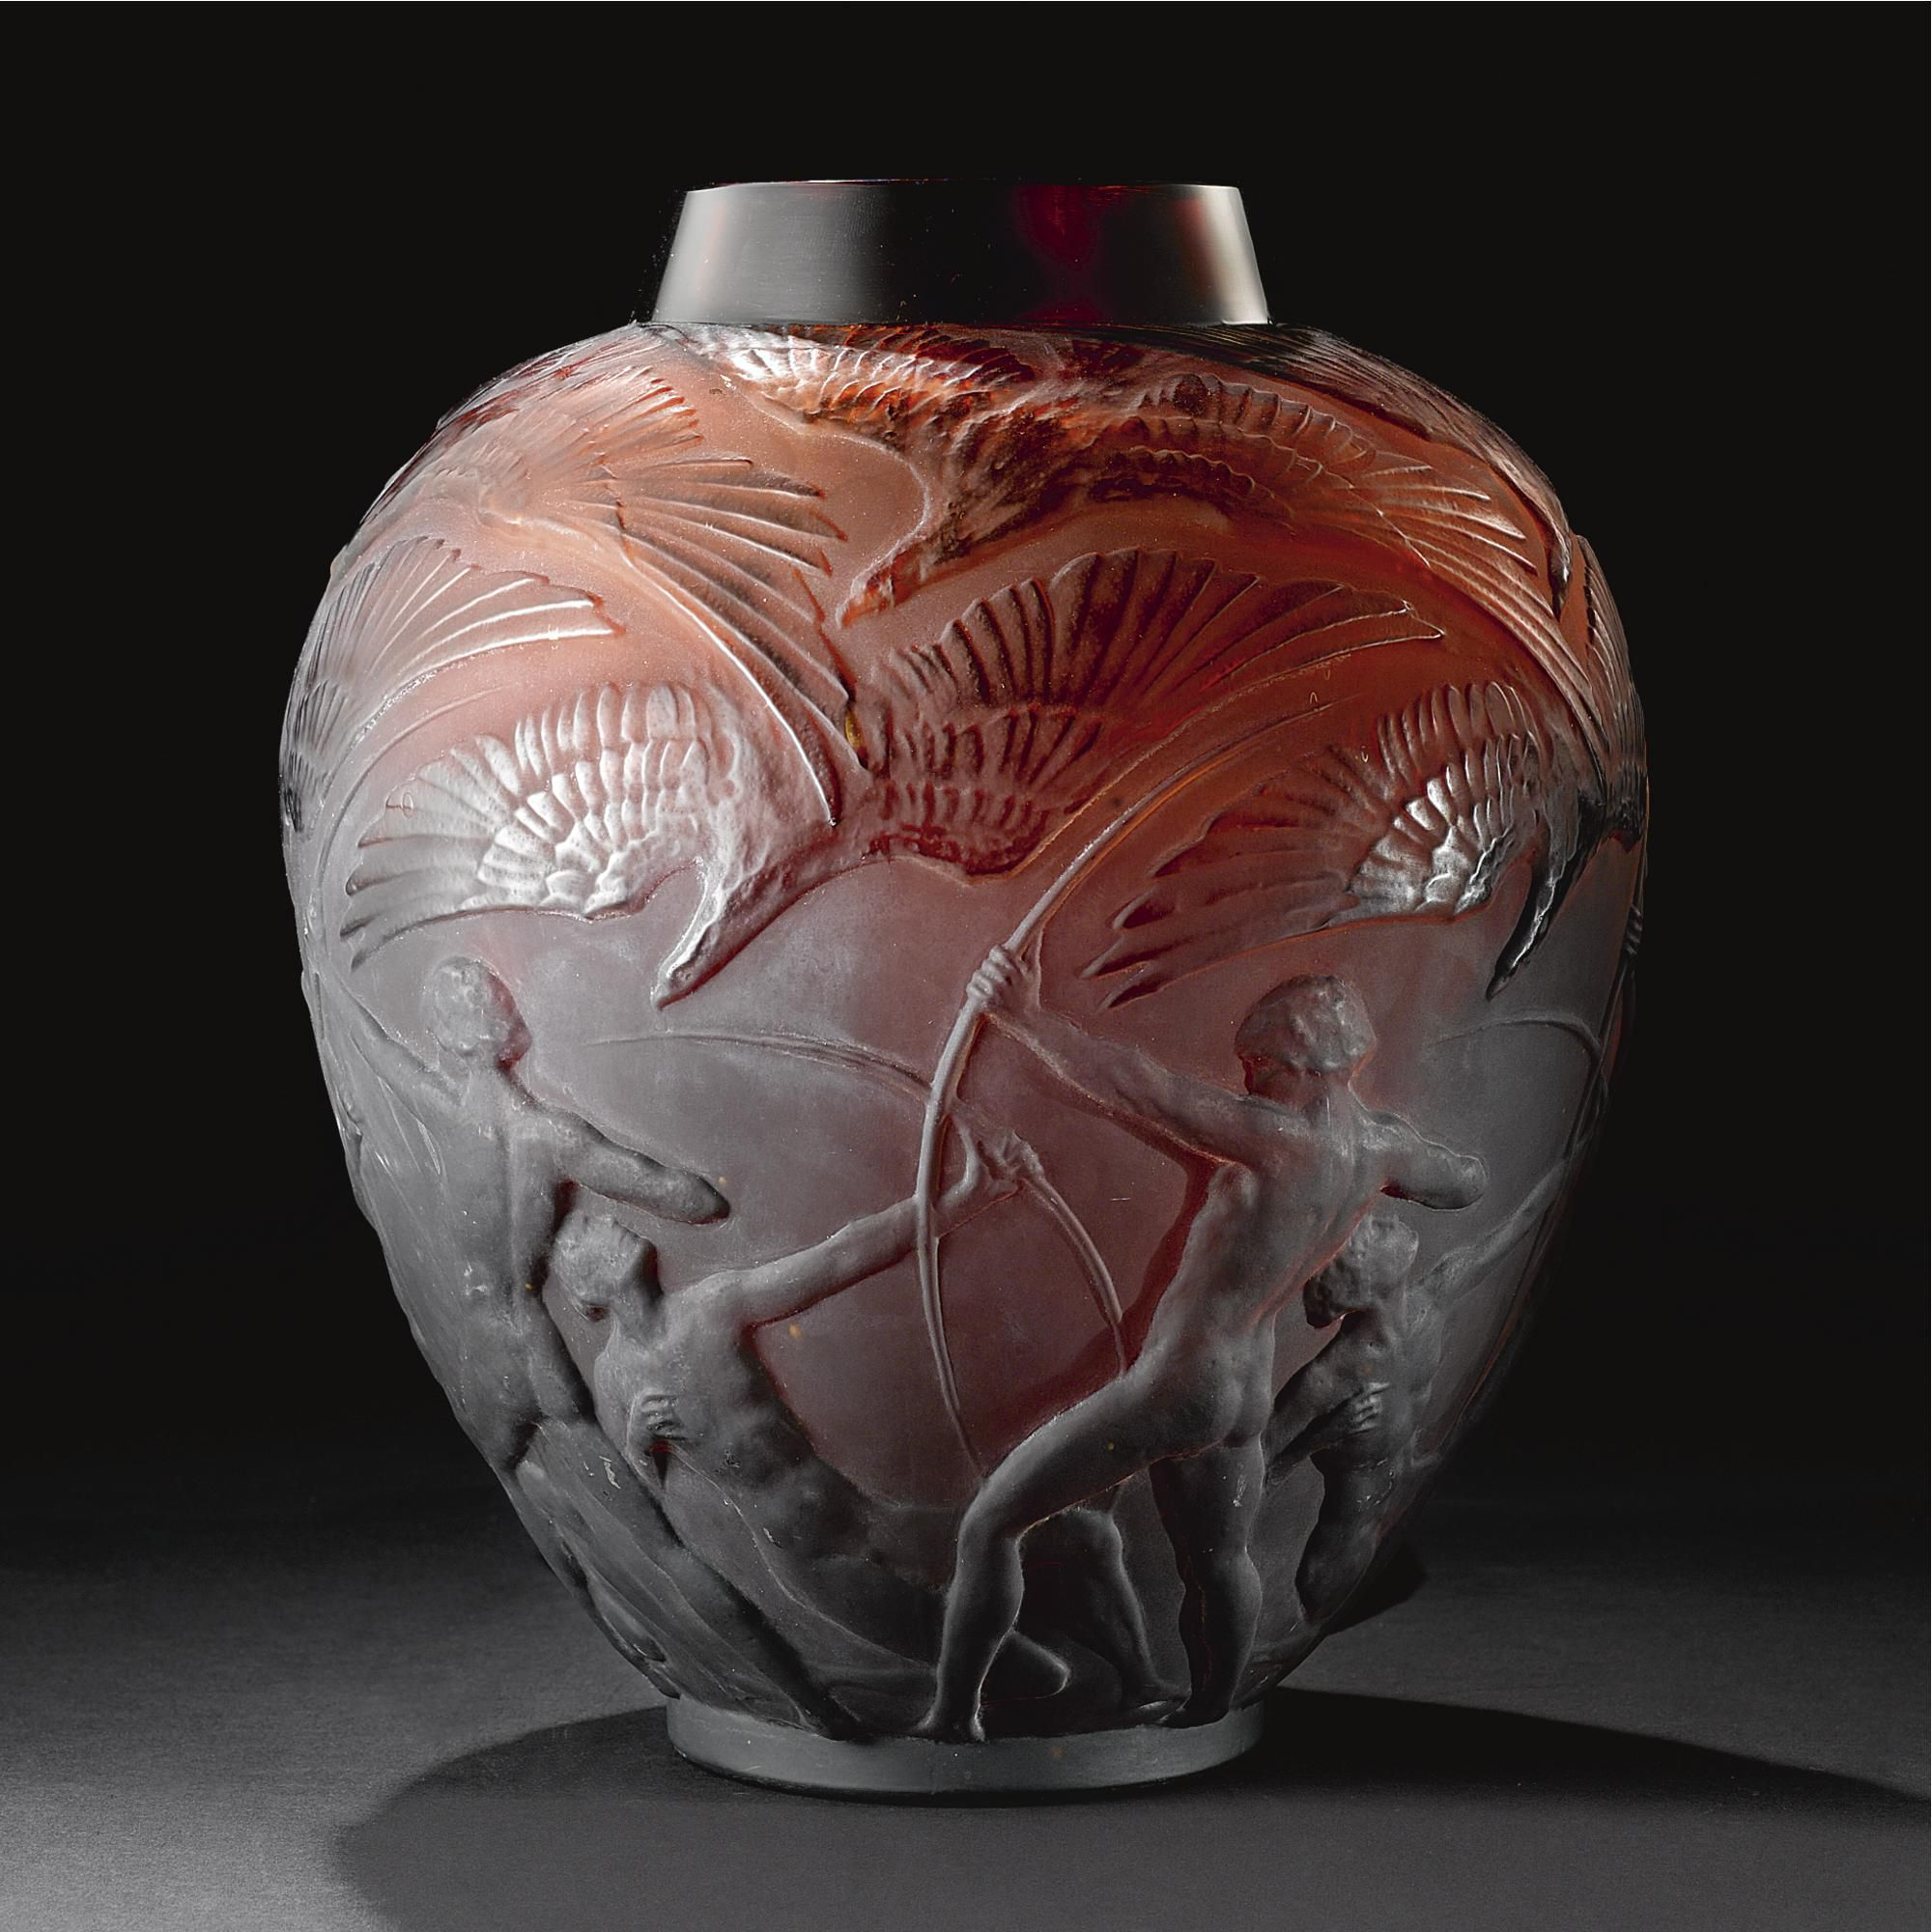 Ren lalique archers vase circa 1921 crystal art pinterest ren lalique archers vase reviewsmspy